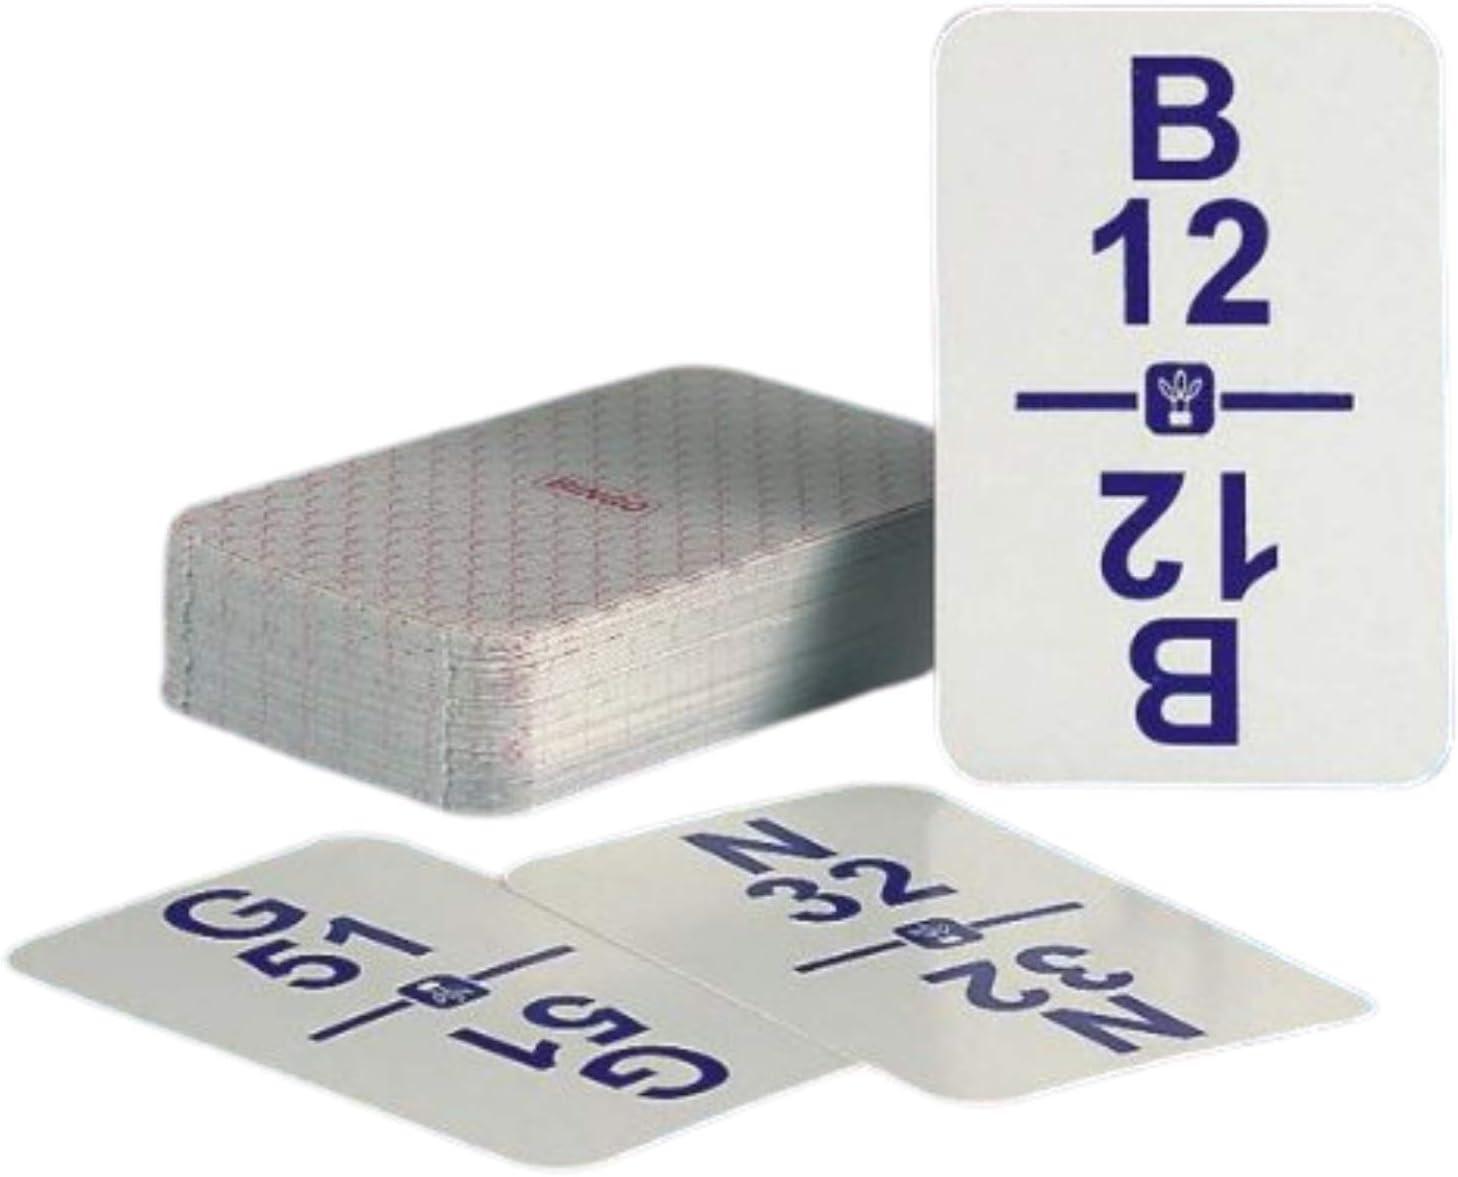 5% OFF Regal Games Bingo Calling Card mart Plastic Deck with Coating Durable